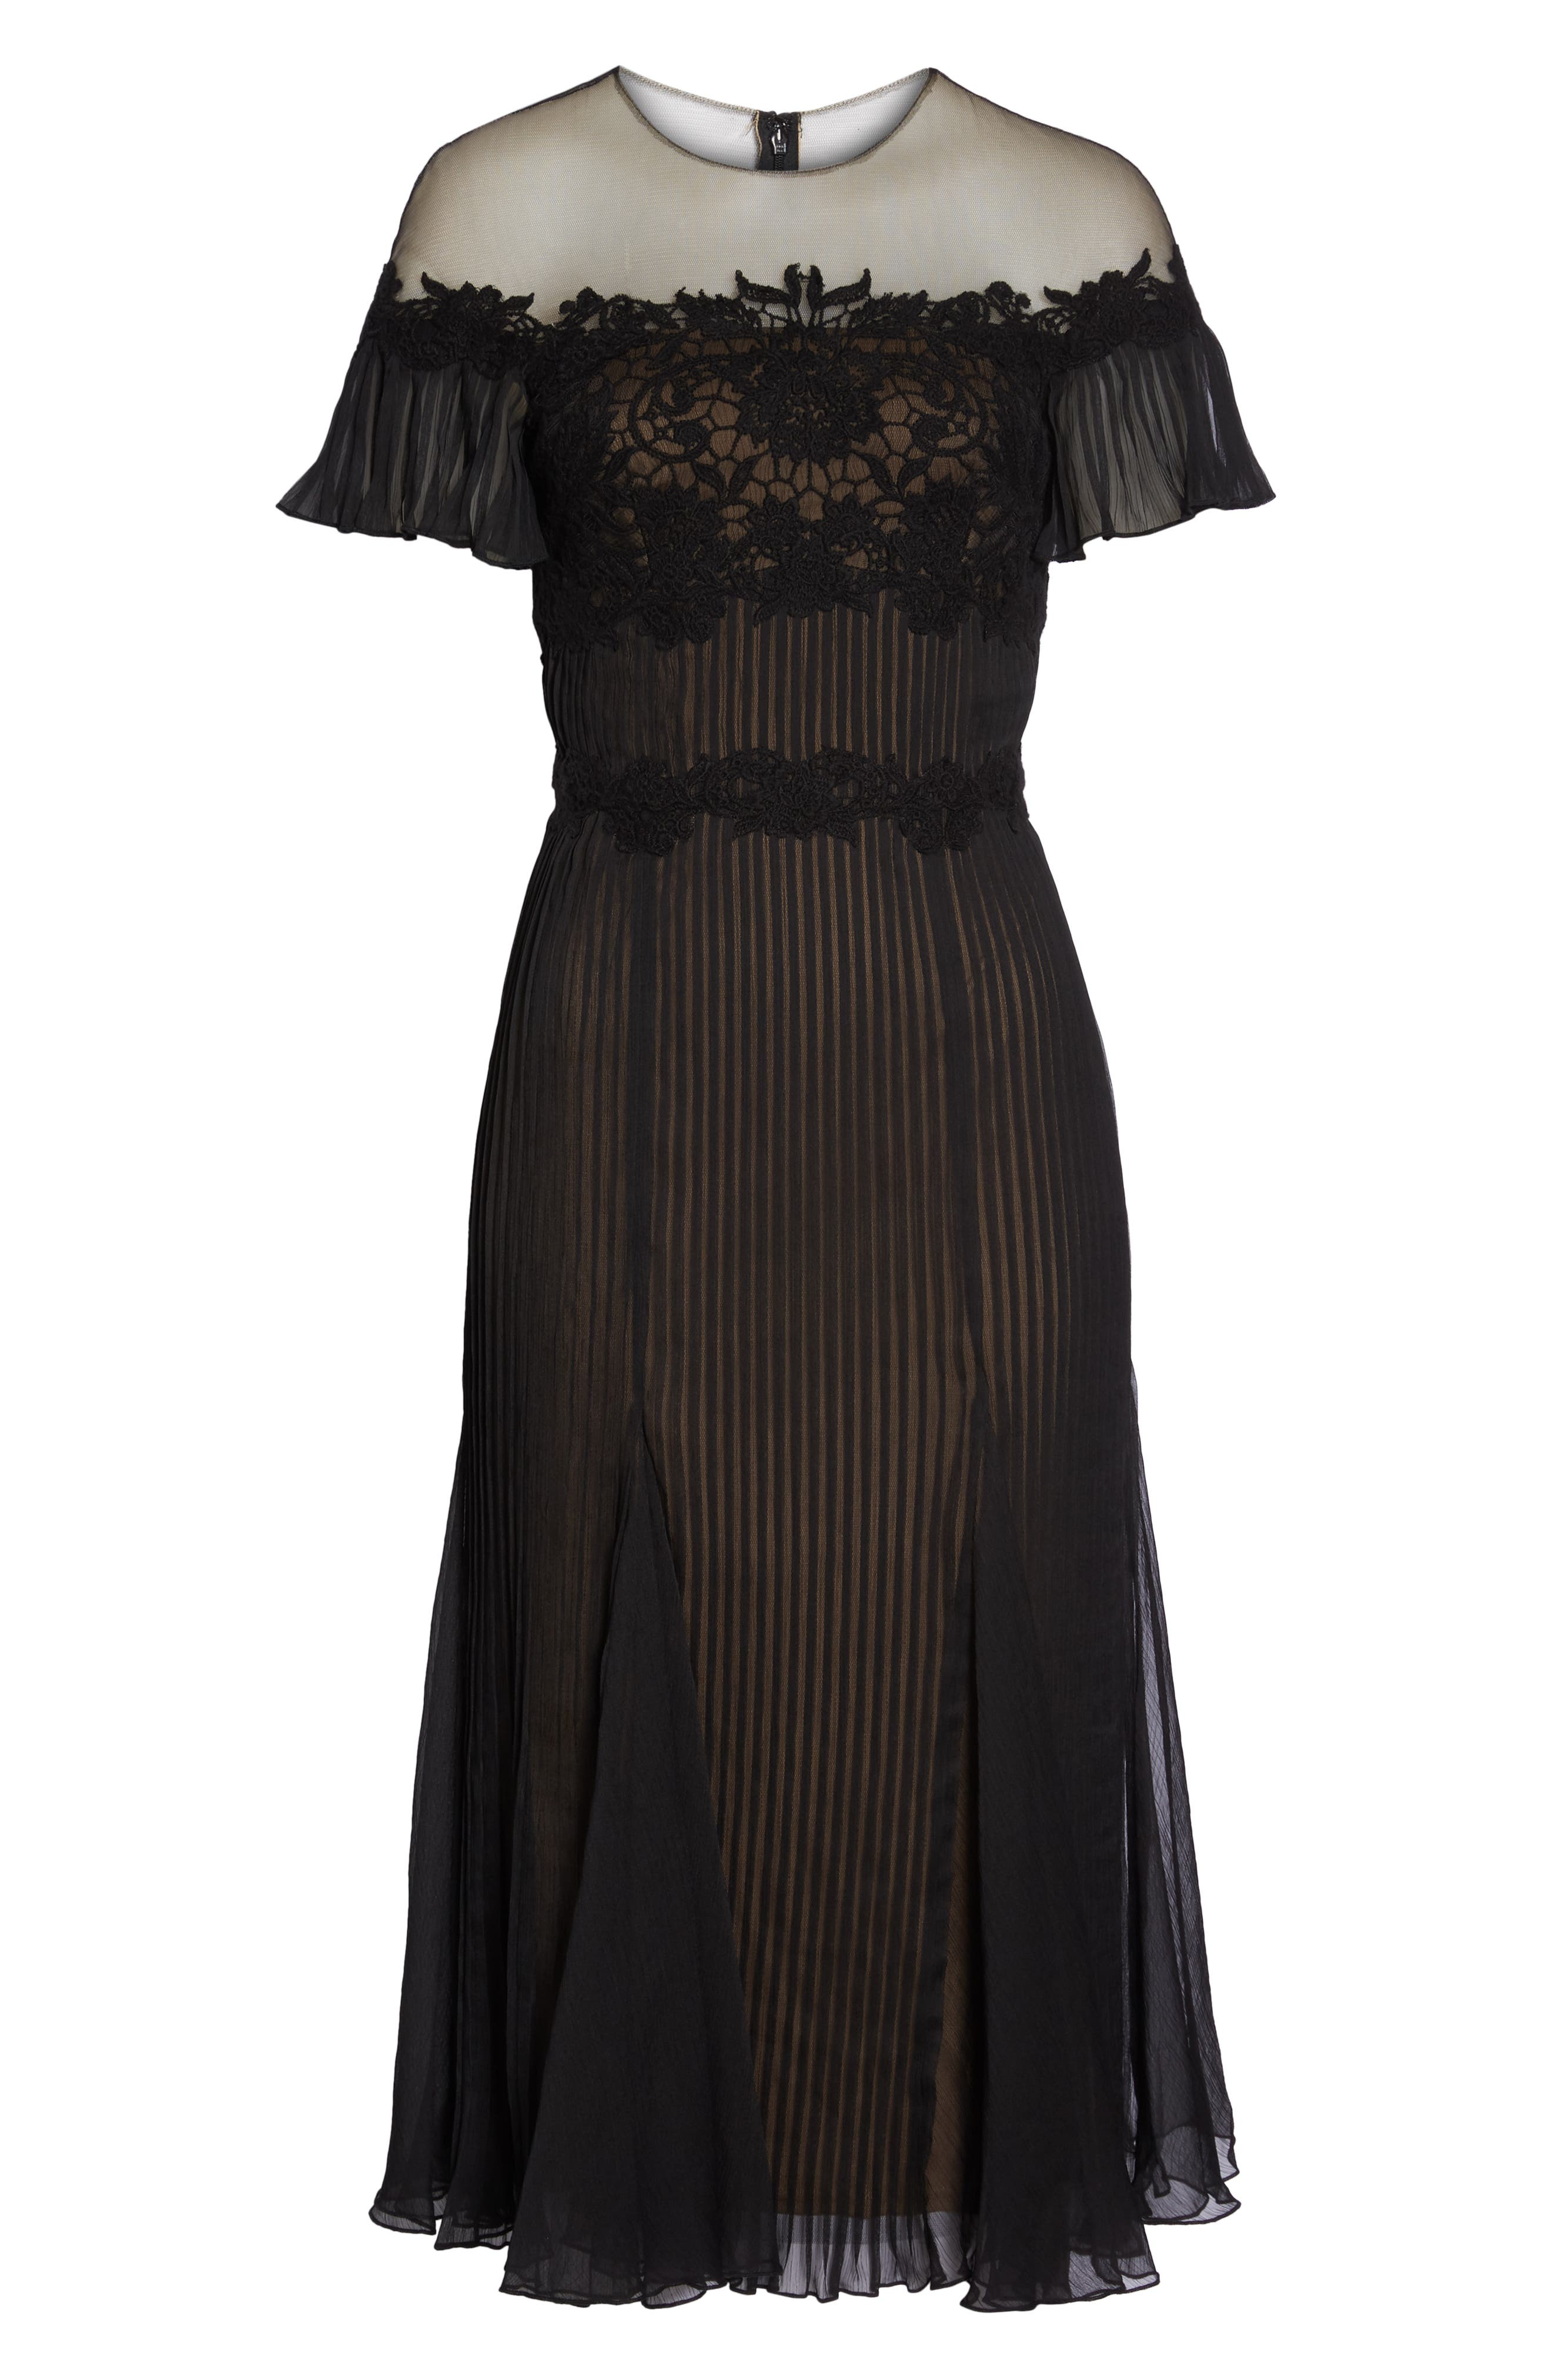 TADASHI SHOJI,                             Lace & Chiffon A-Line Dress,                             Alternate thumbnail 7, color,                             004